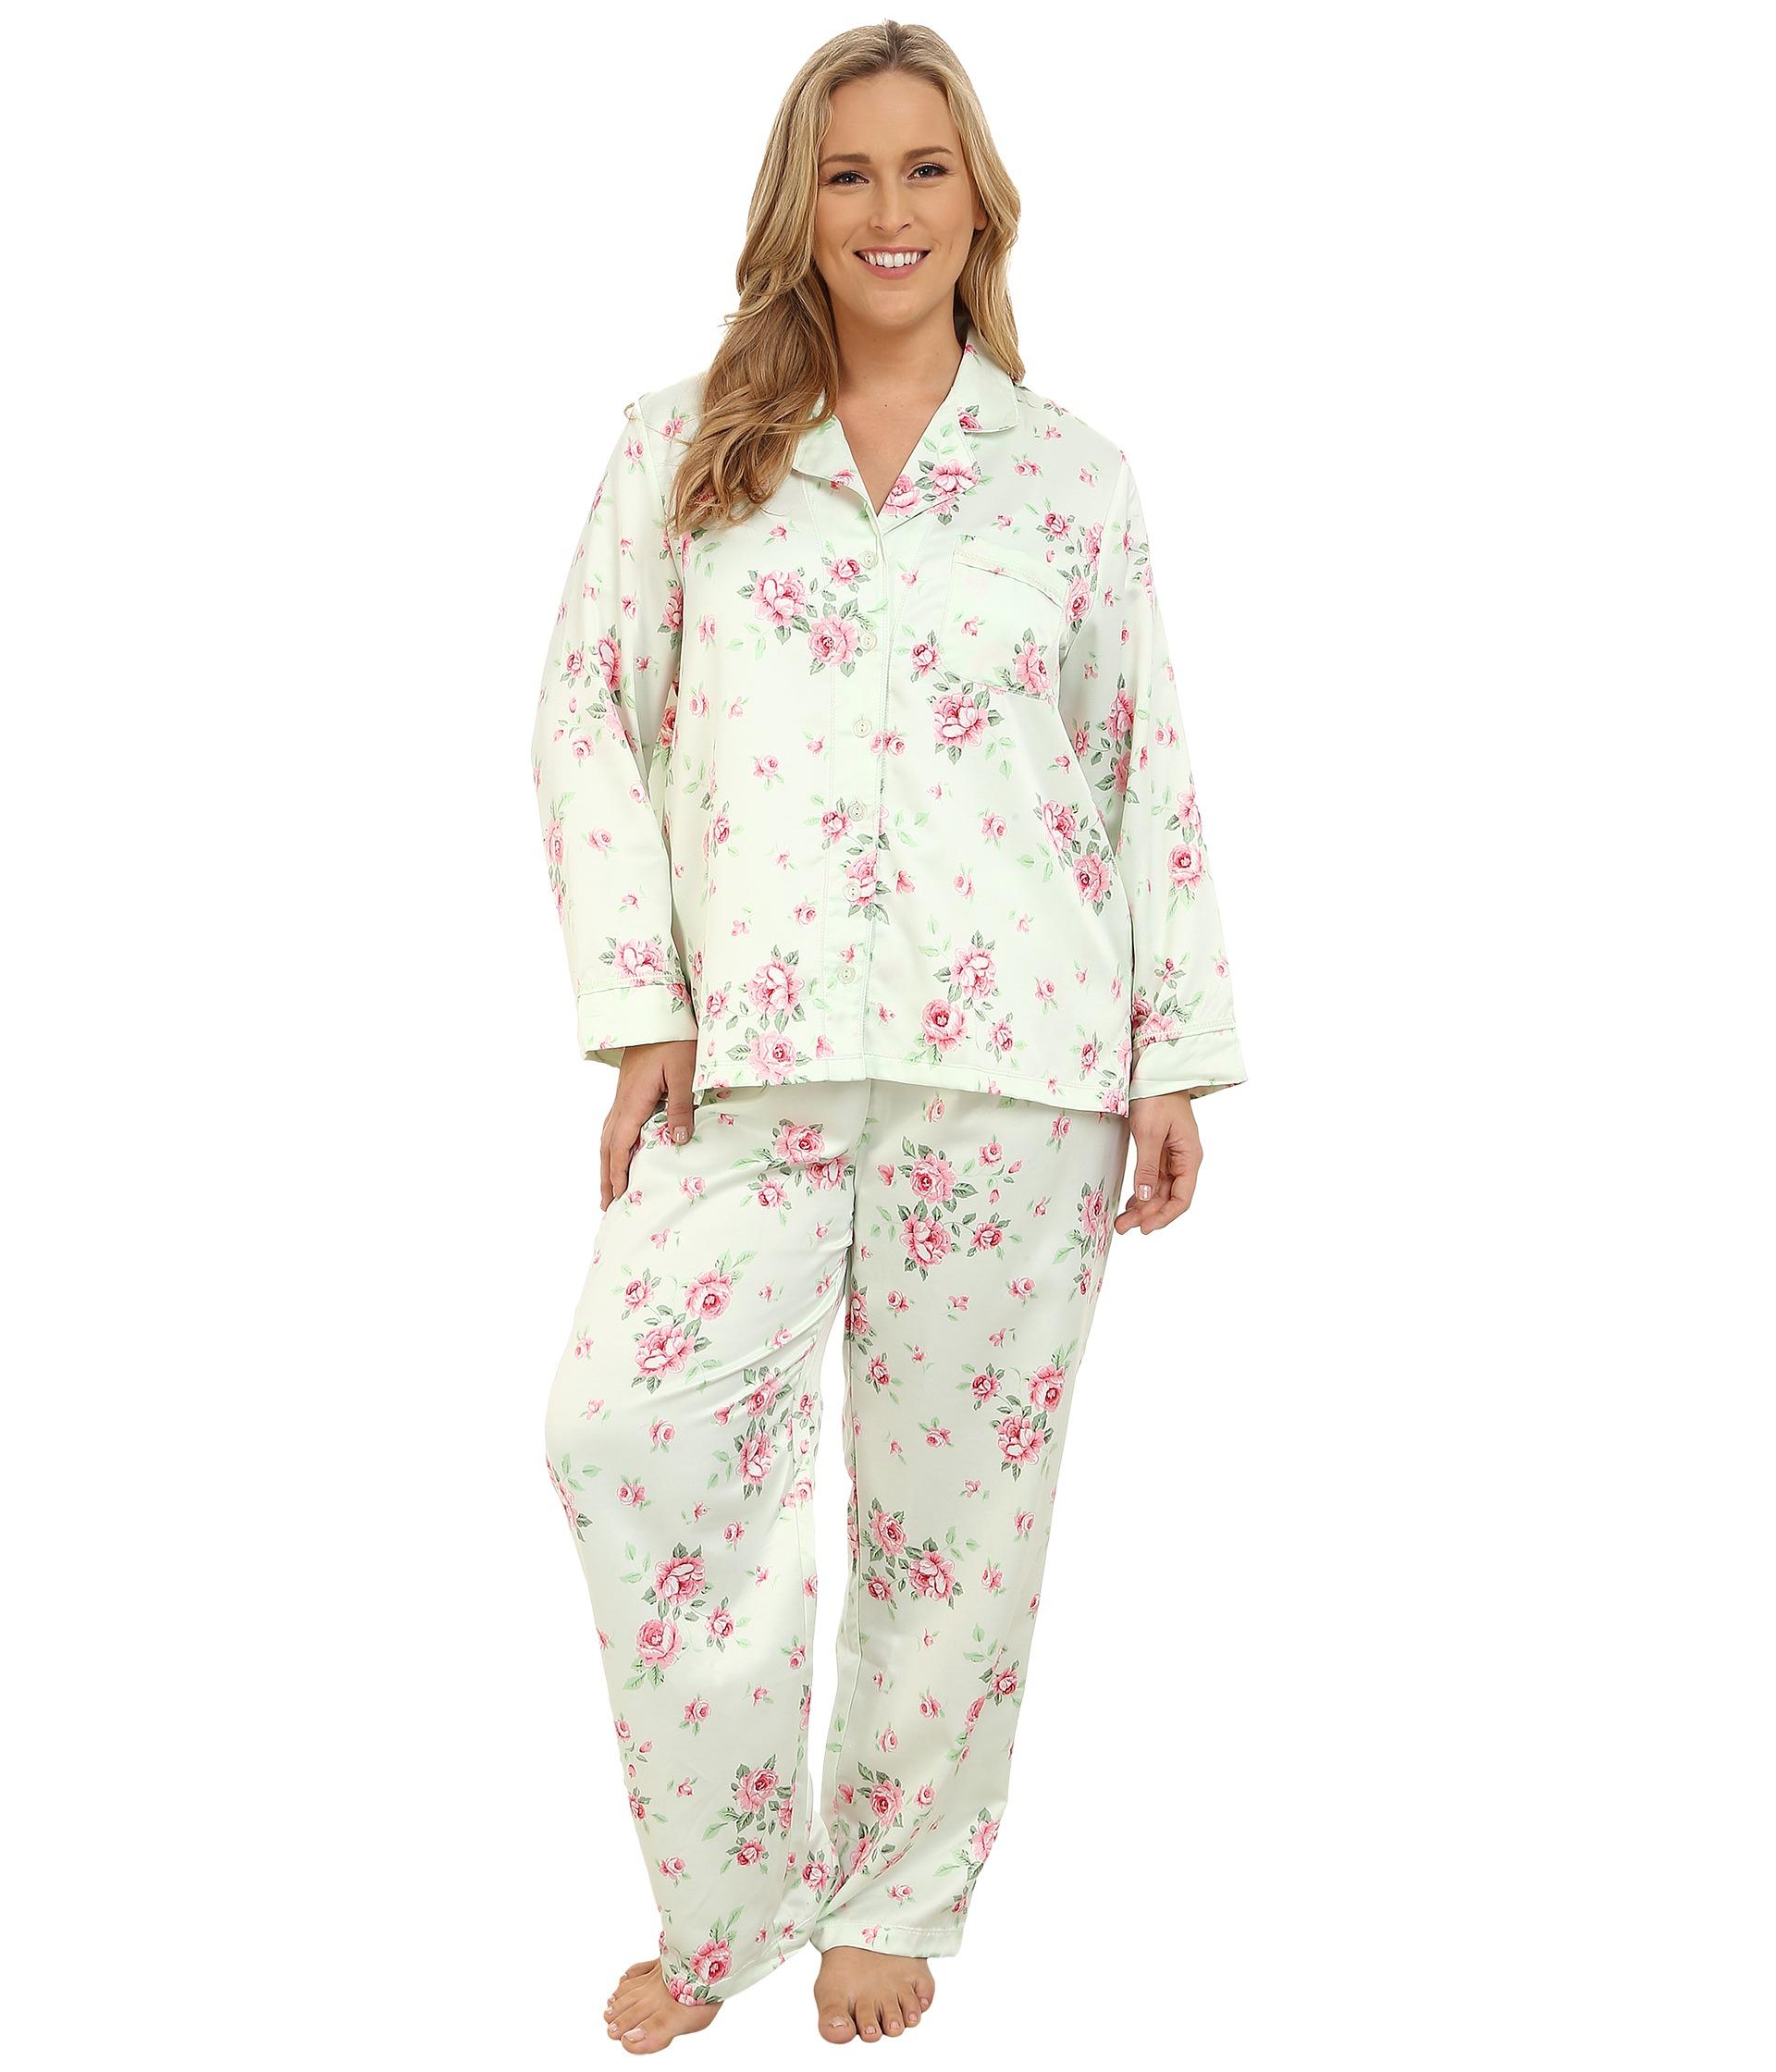 Lyst Carole Hochman Plus Size Packaged Brush Back Satin Pajama in